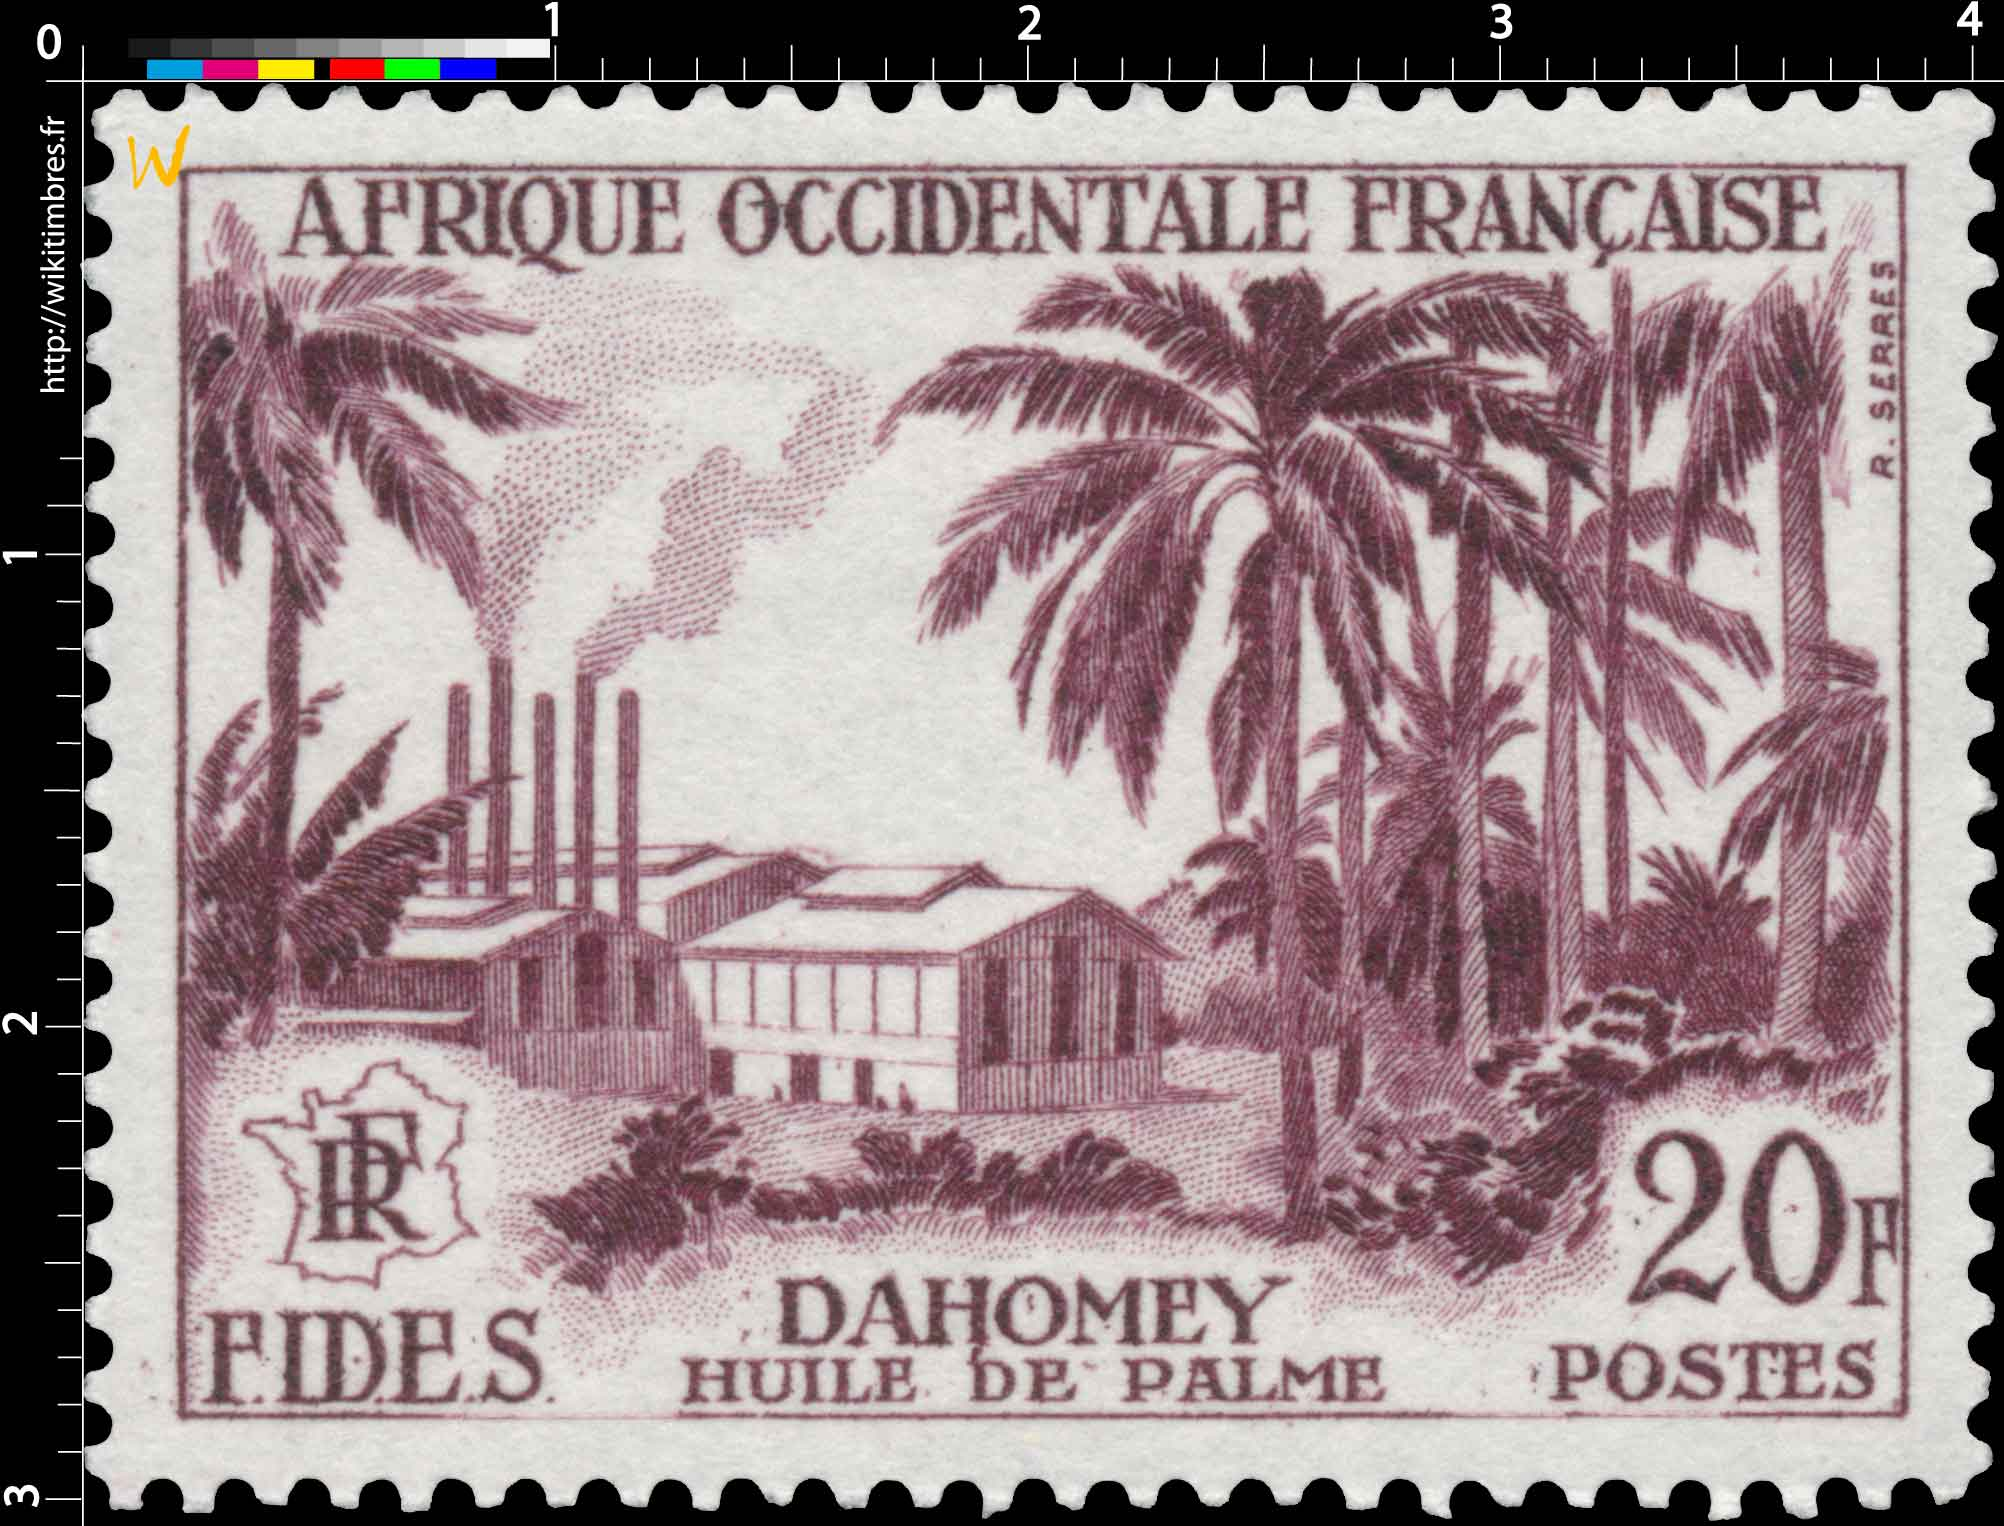 Afrique Occidentale Française - F.I.D.E.S. - huile de palme Dahomey